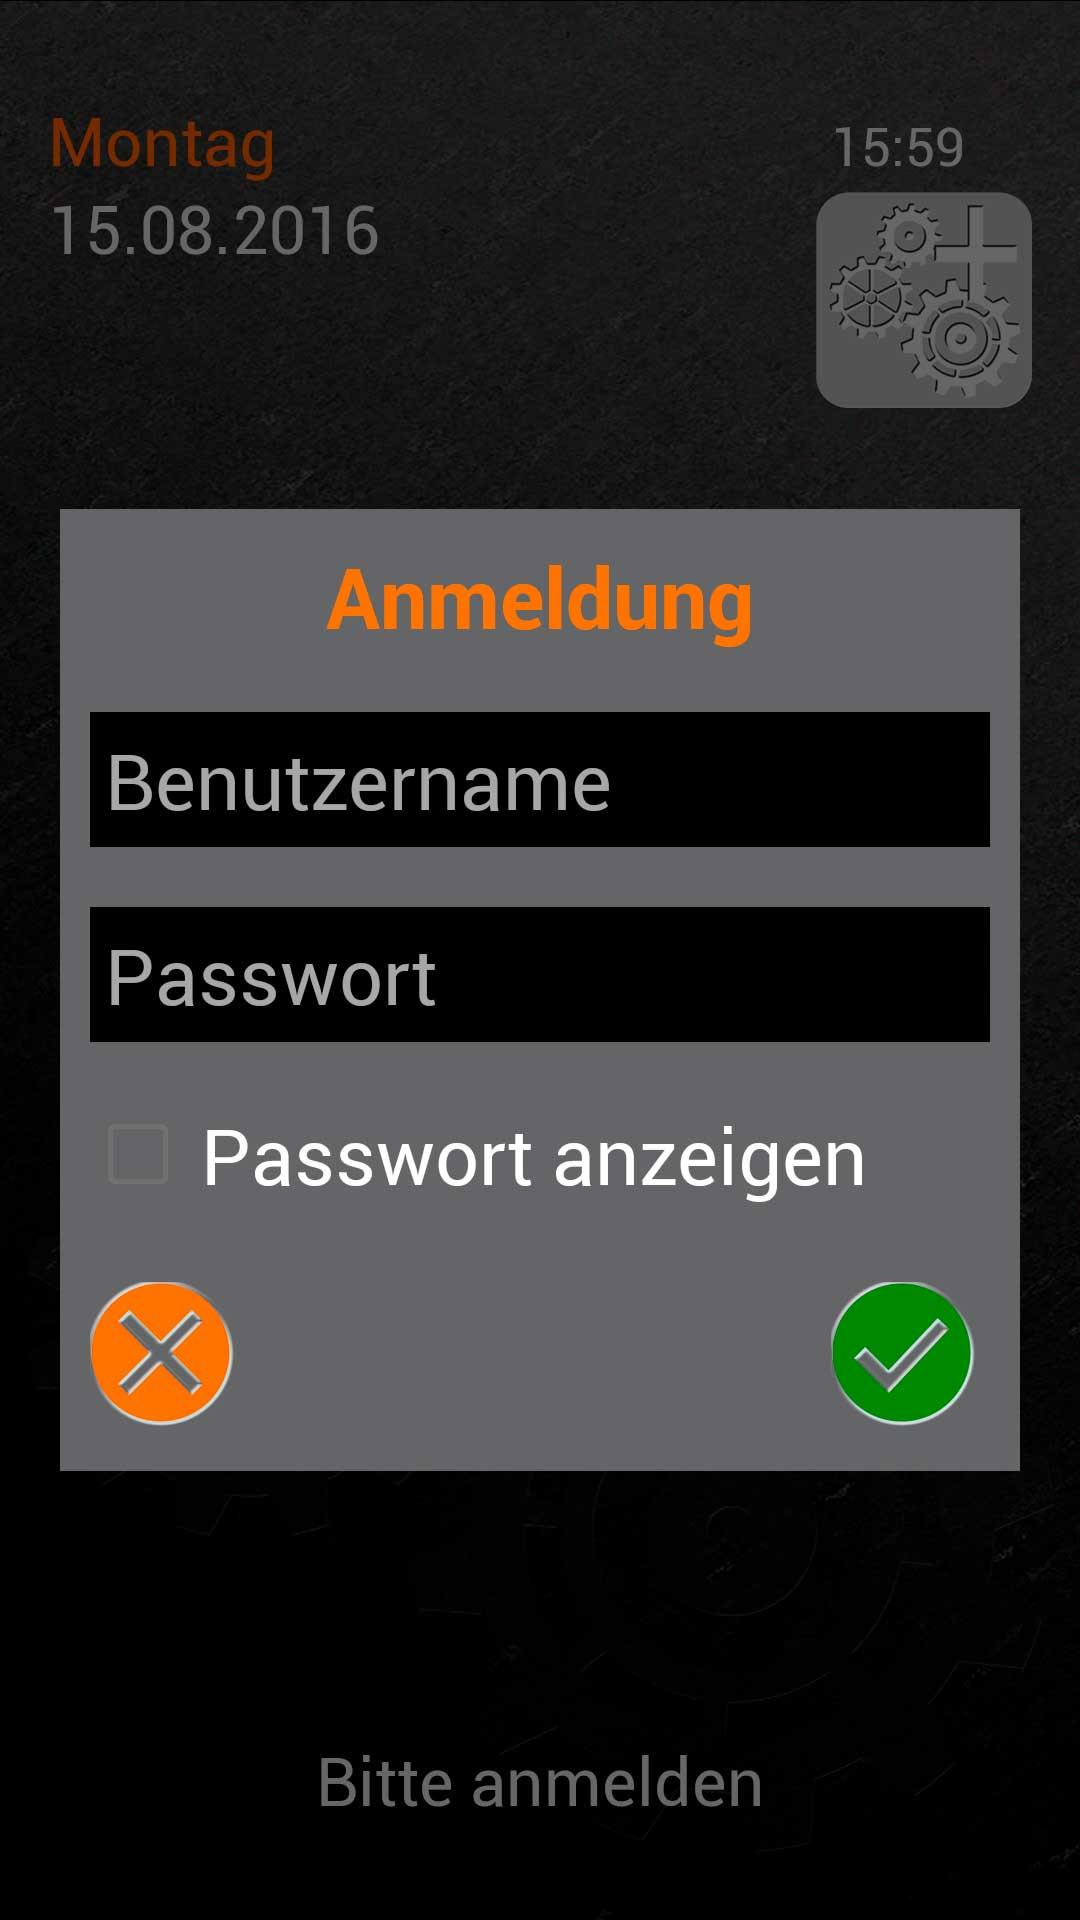 ginstr_app_industrialMaintenanceManagerPlus_DE_1